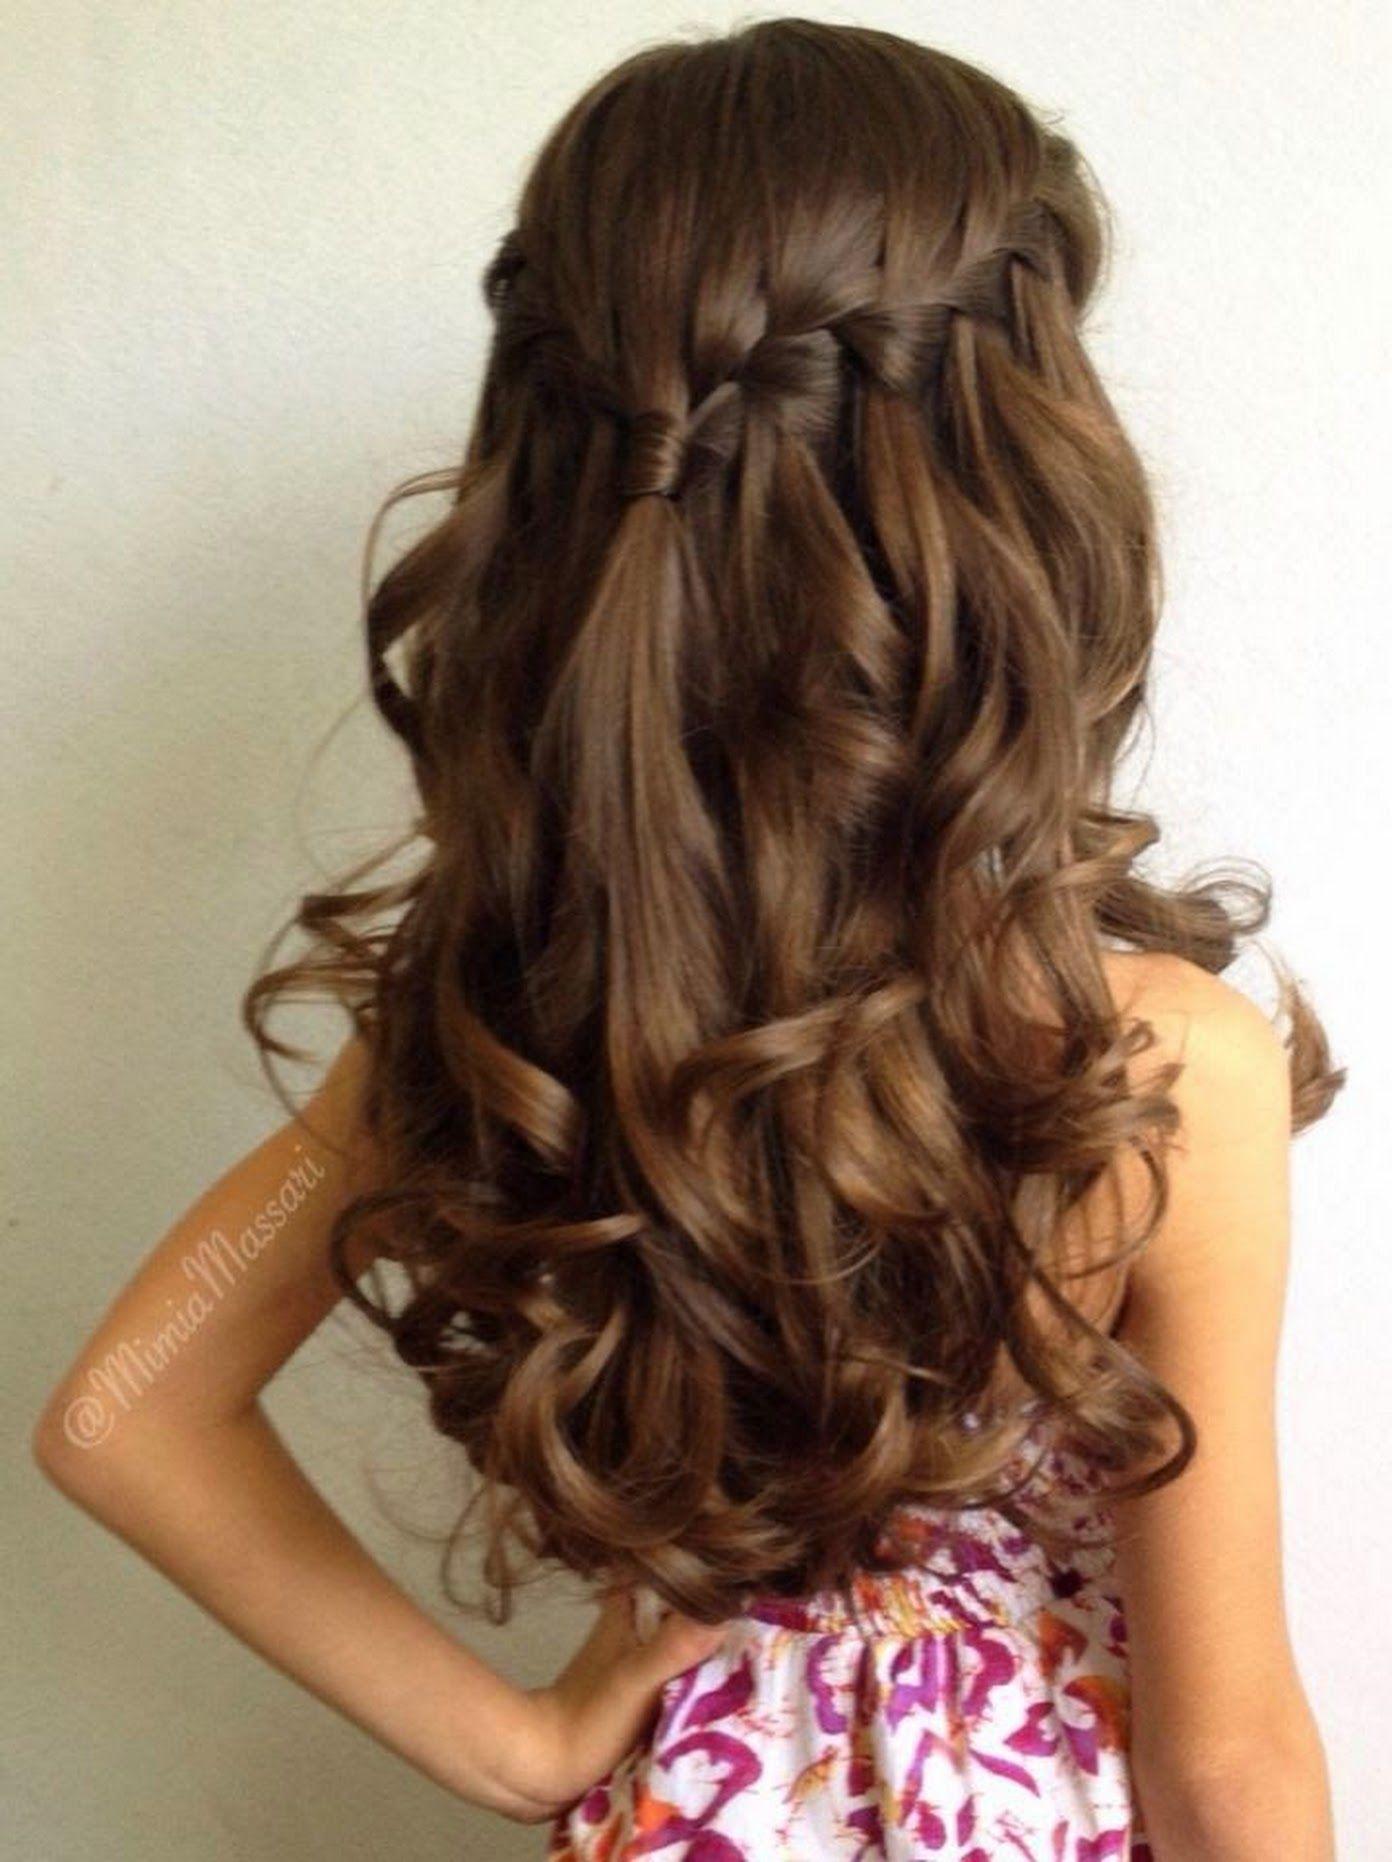 Ria Riva - Google+ | การสอน | Pinterest | Hair style, Prom hair and ...